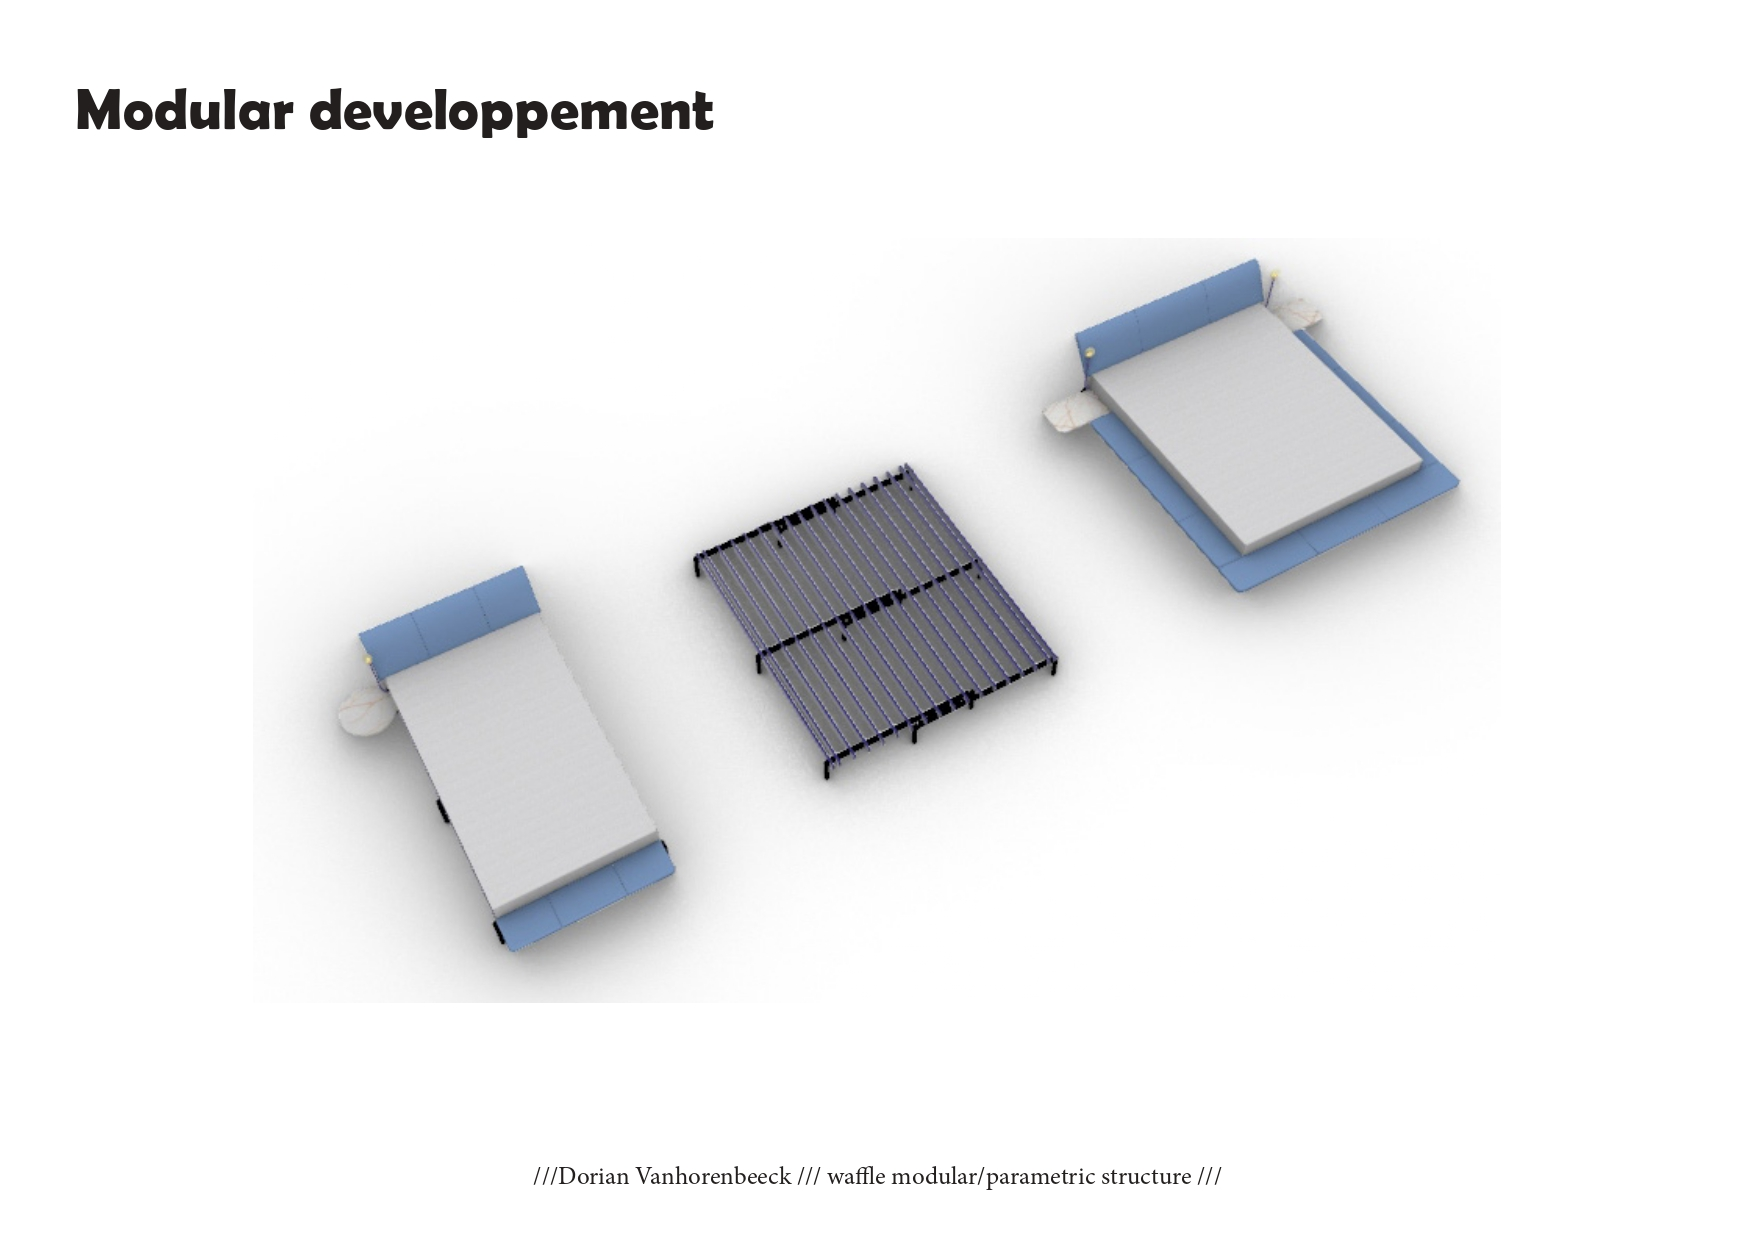 Livret Waffle modular-parametric Structure Dorian Vanhorenbeeck_page-0009